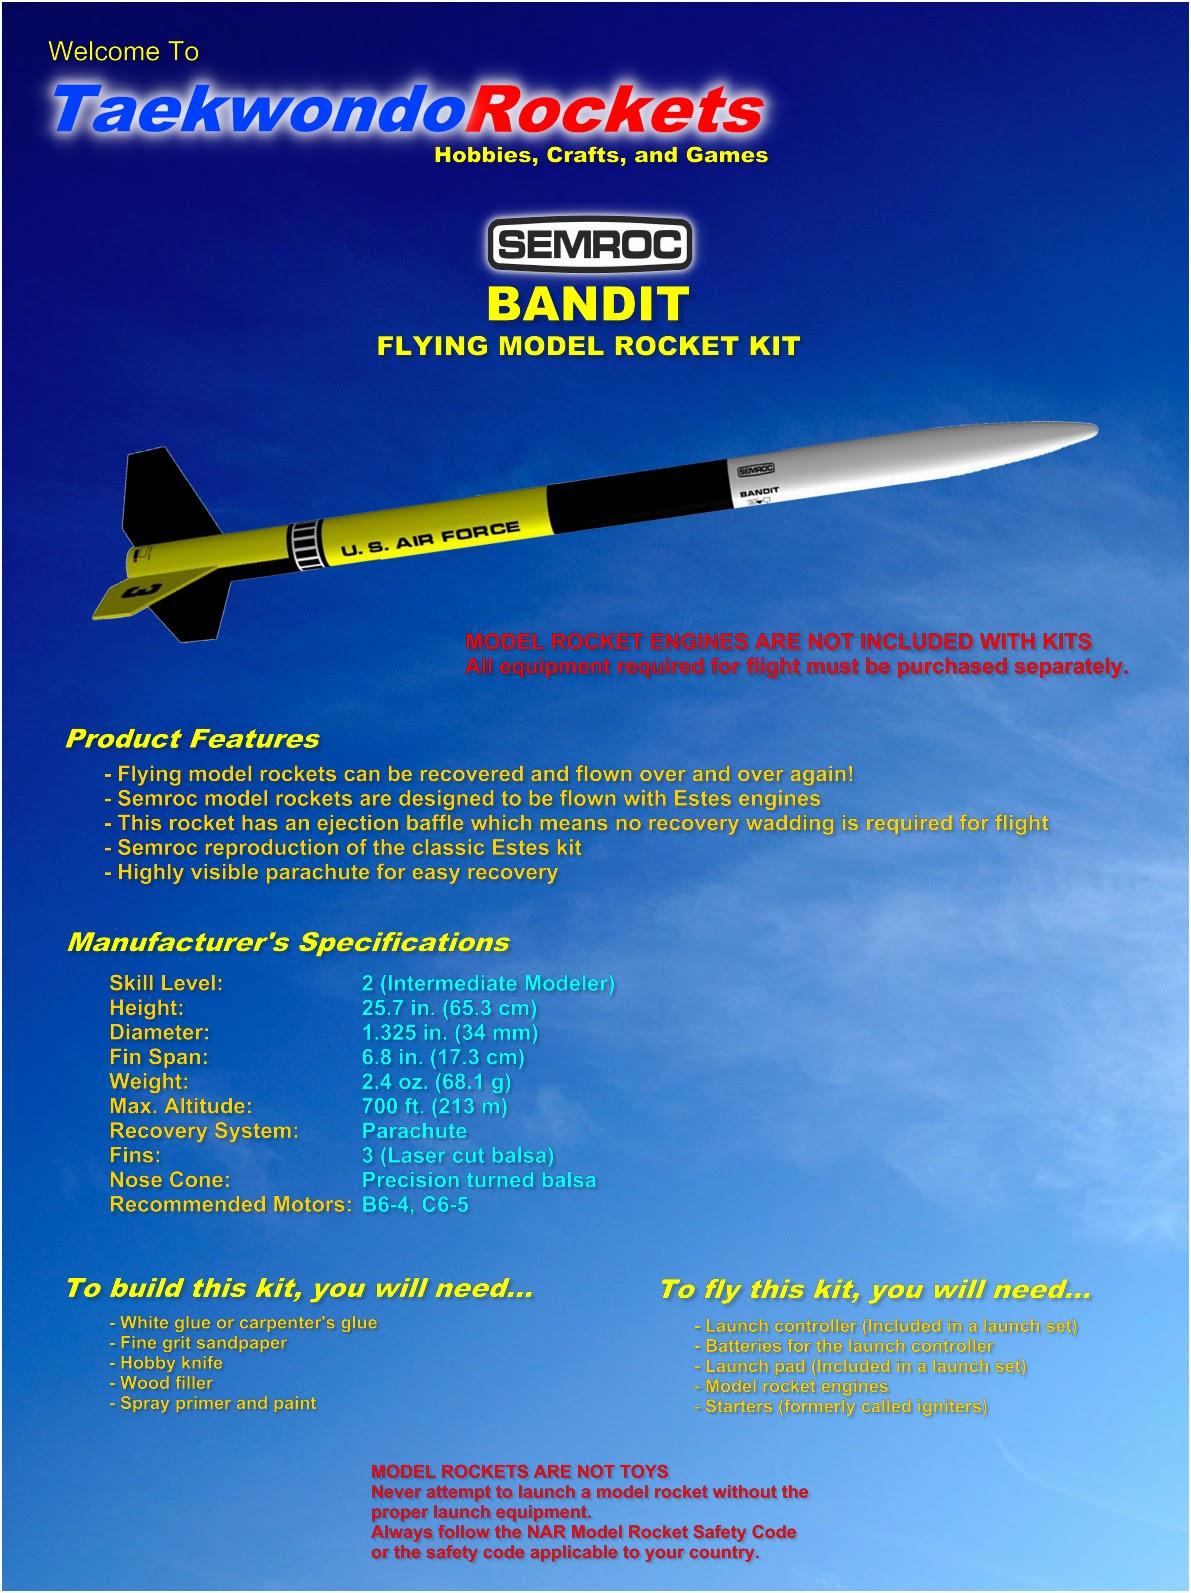 Models & Kits Semroc Flying Model Rocket Kit Bandit SEM-KV